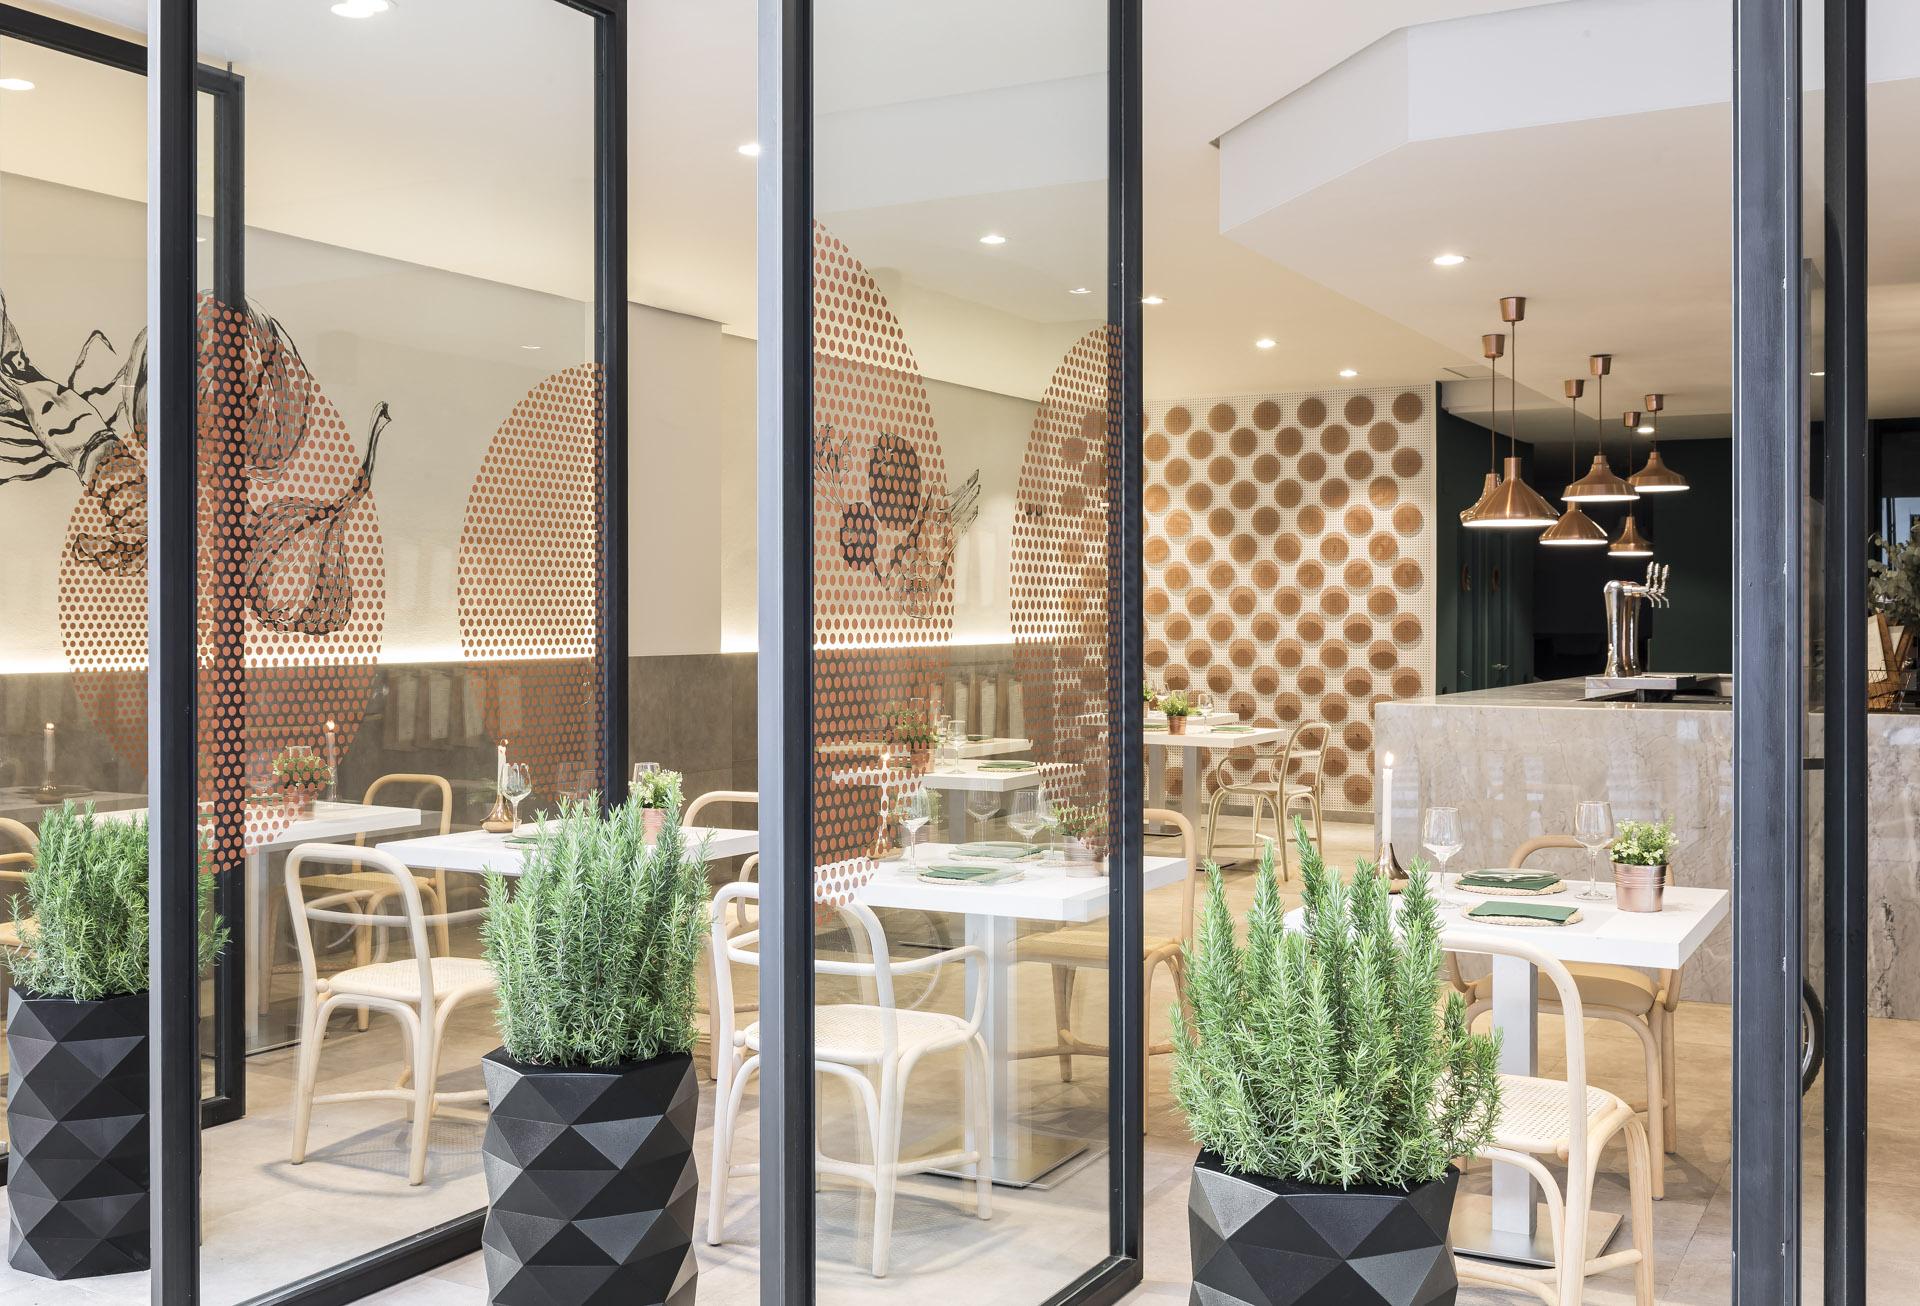 fotografia-arquitectura-valencia-german-cabo-estudihac-restaurante-nac-ontinyent-05